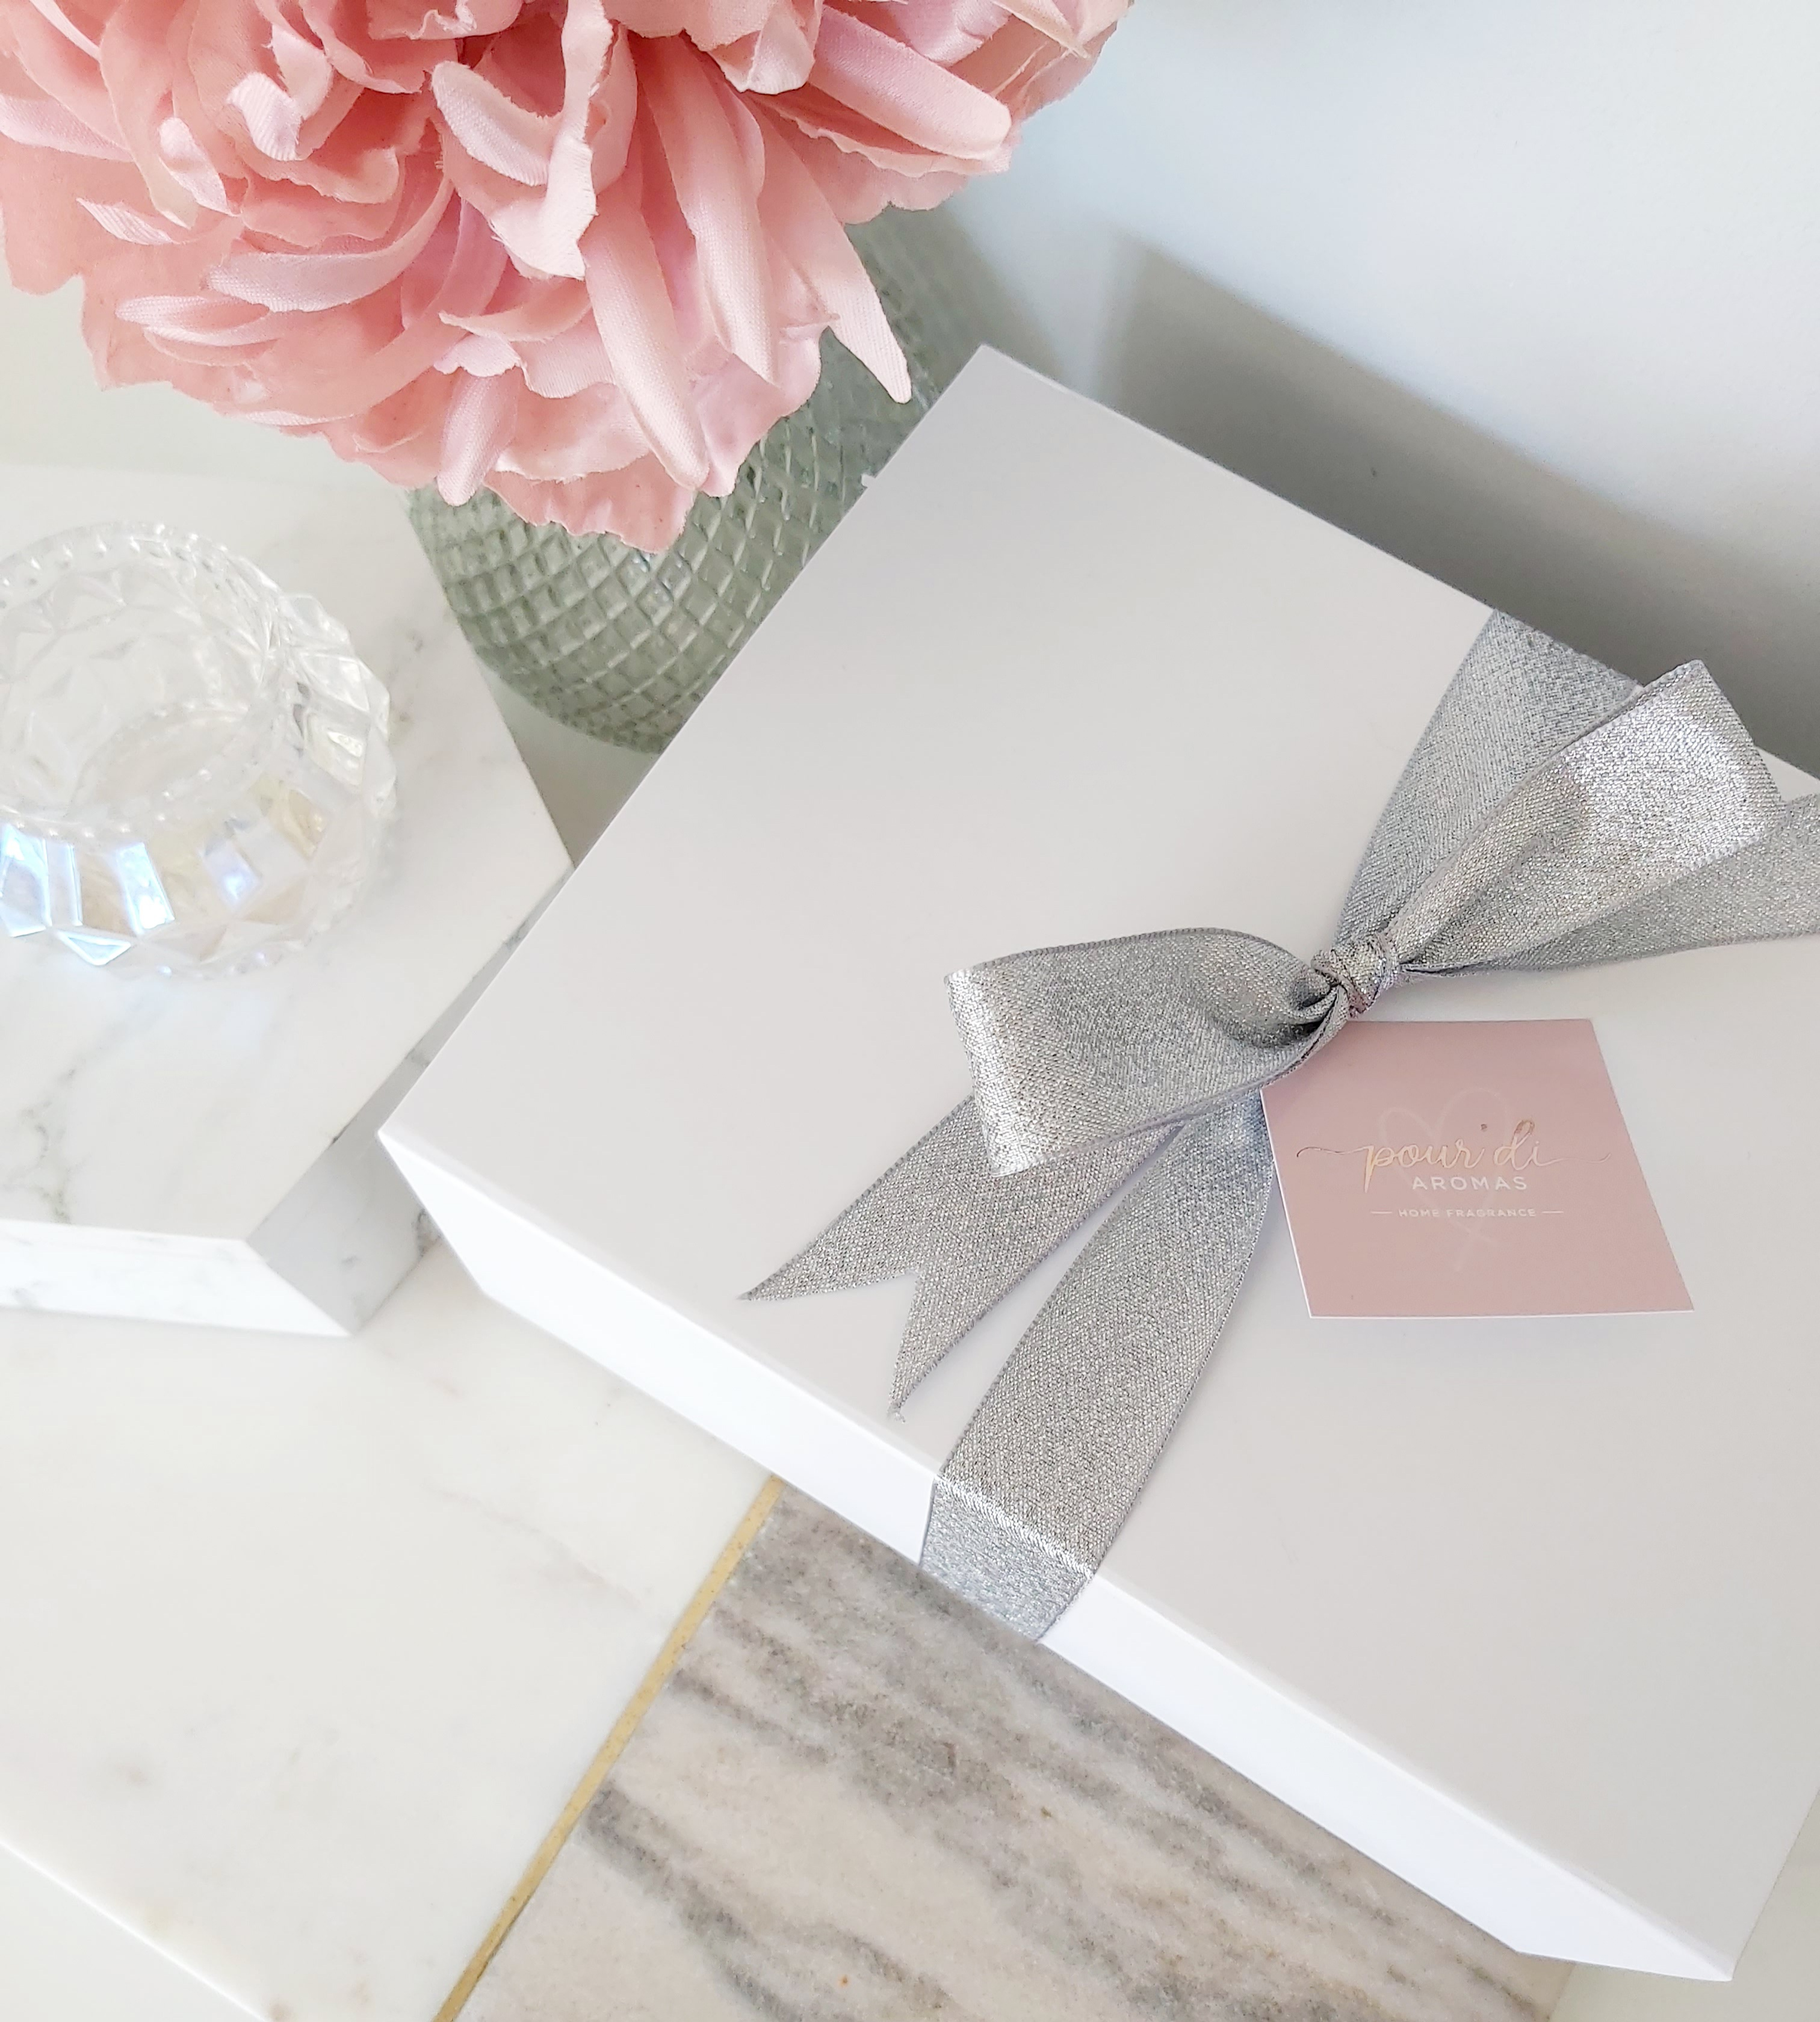 Perfume Collection Gift Set